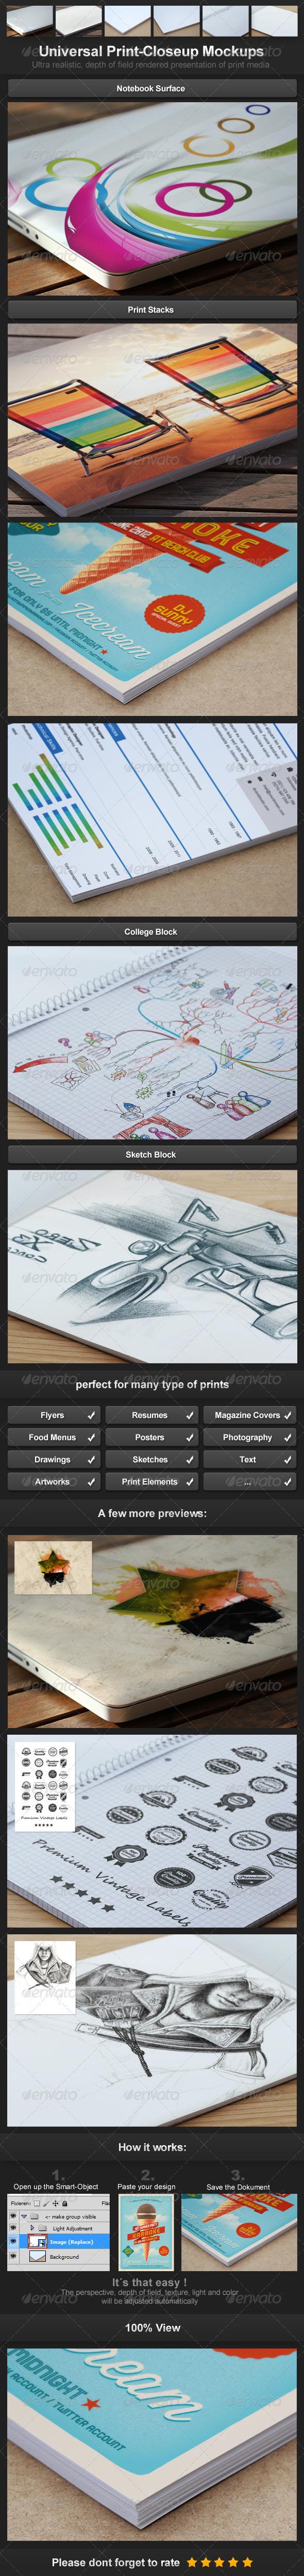 GraphicRiver Universal Print-Closeup Mockups 3296797